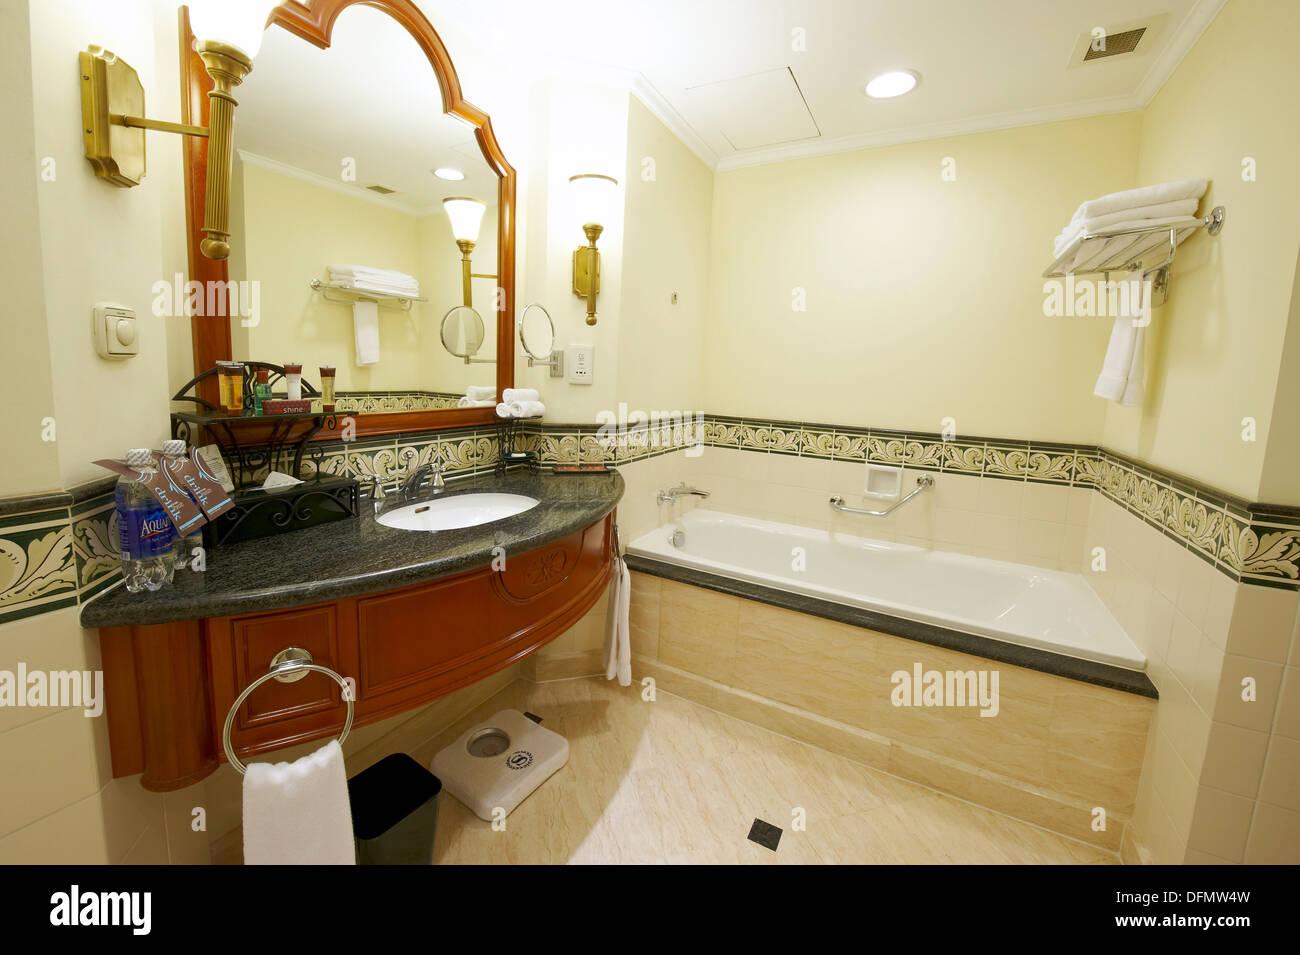 bathroom in a sheraton five star hotel stock photo 61309721 alamy rh alamy com 5 star hotel bathroom amenities 5 star hotel bathroom accessories